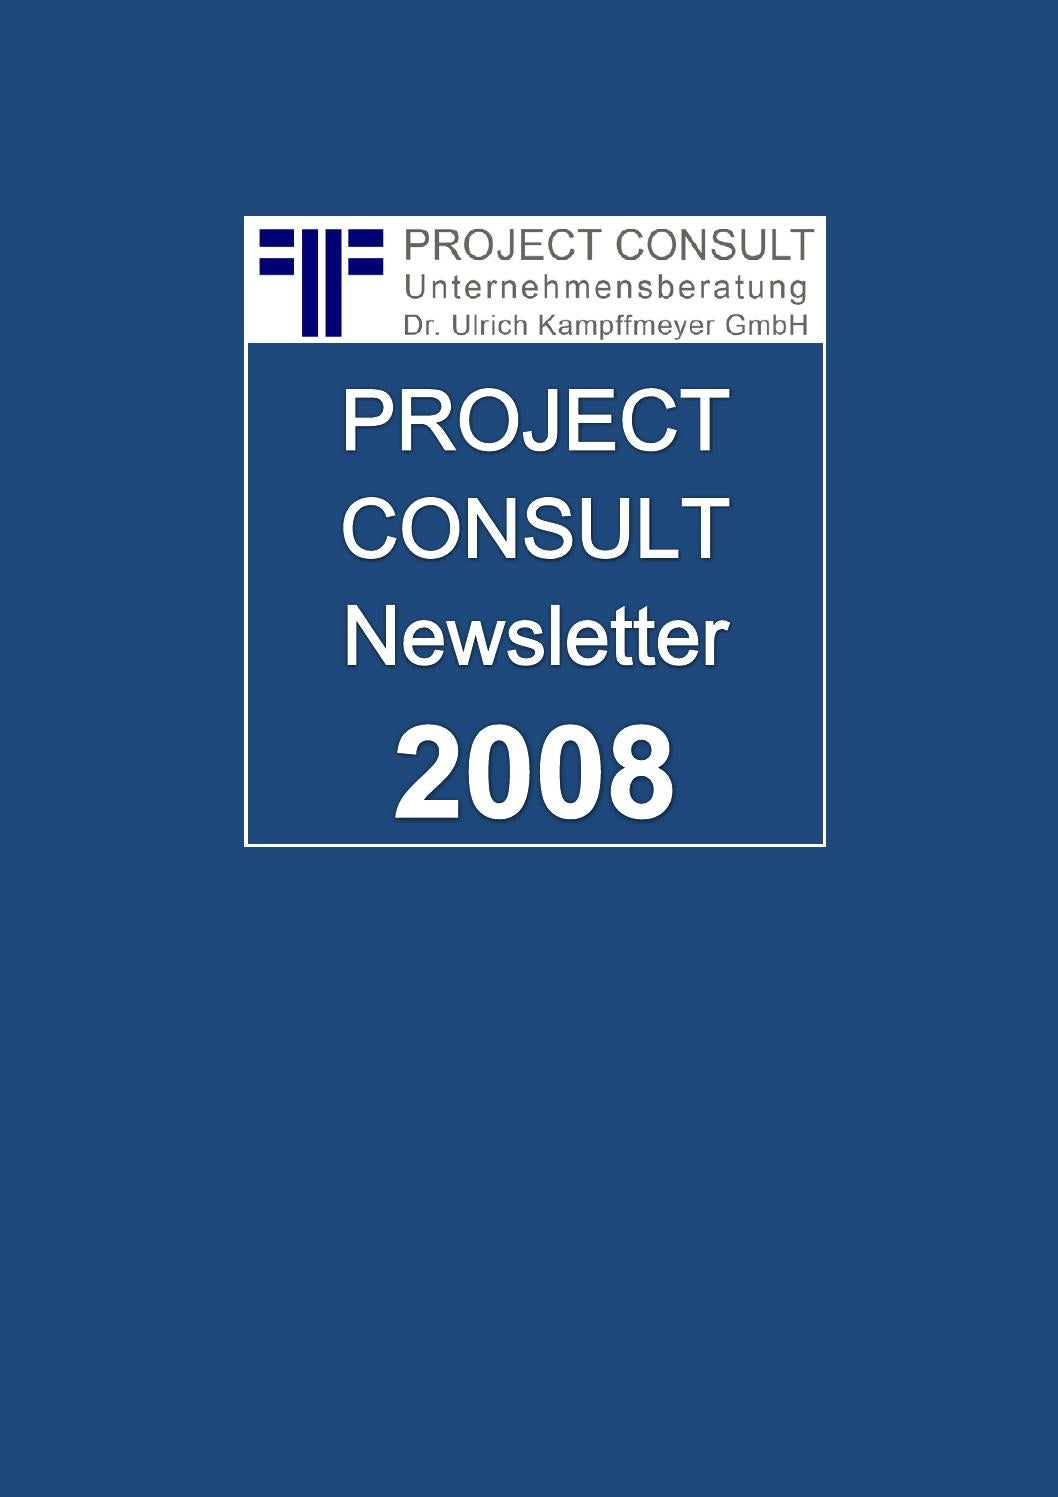 DE] PROJECT CONSULT Newsletter 2008 | Dr. Ulrich Kampffmeyer ...